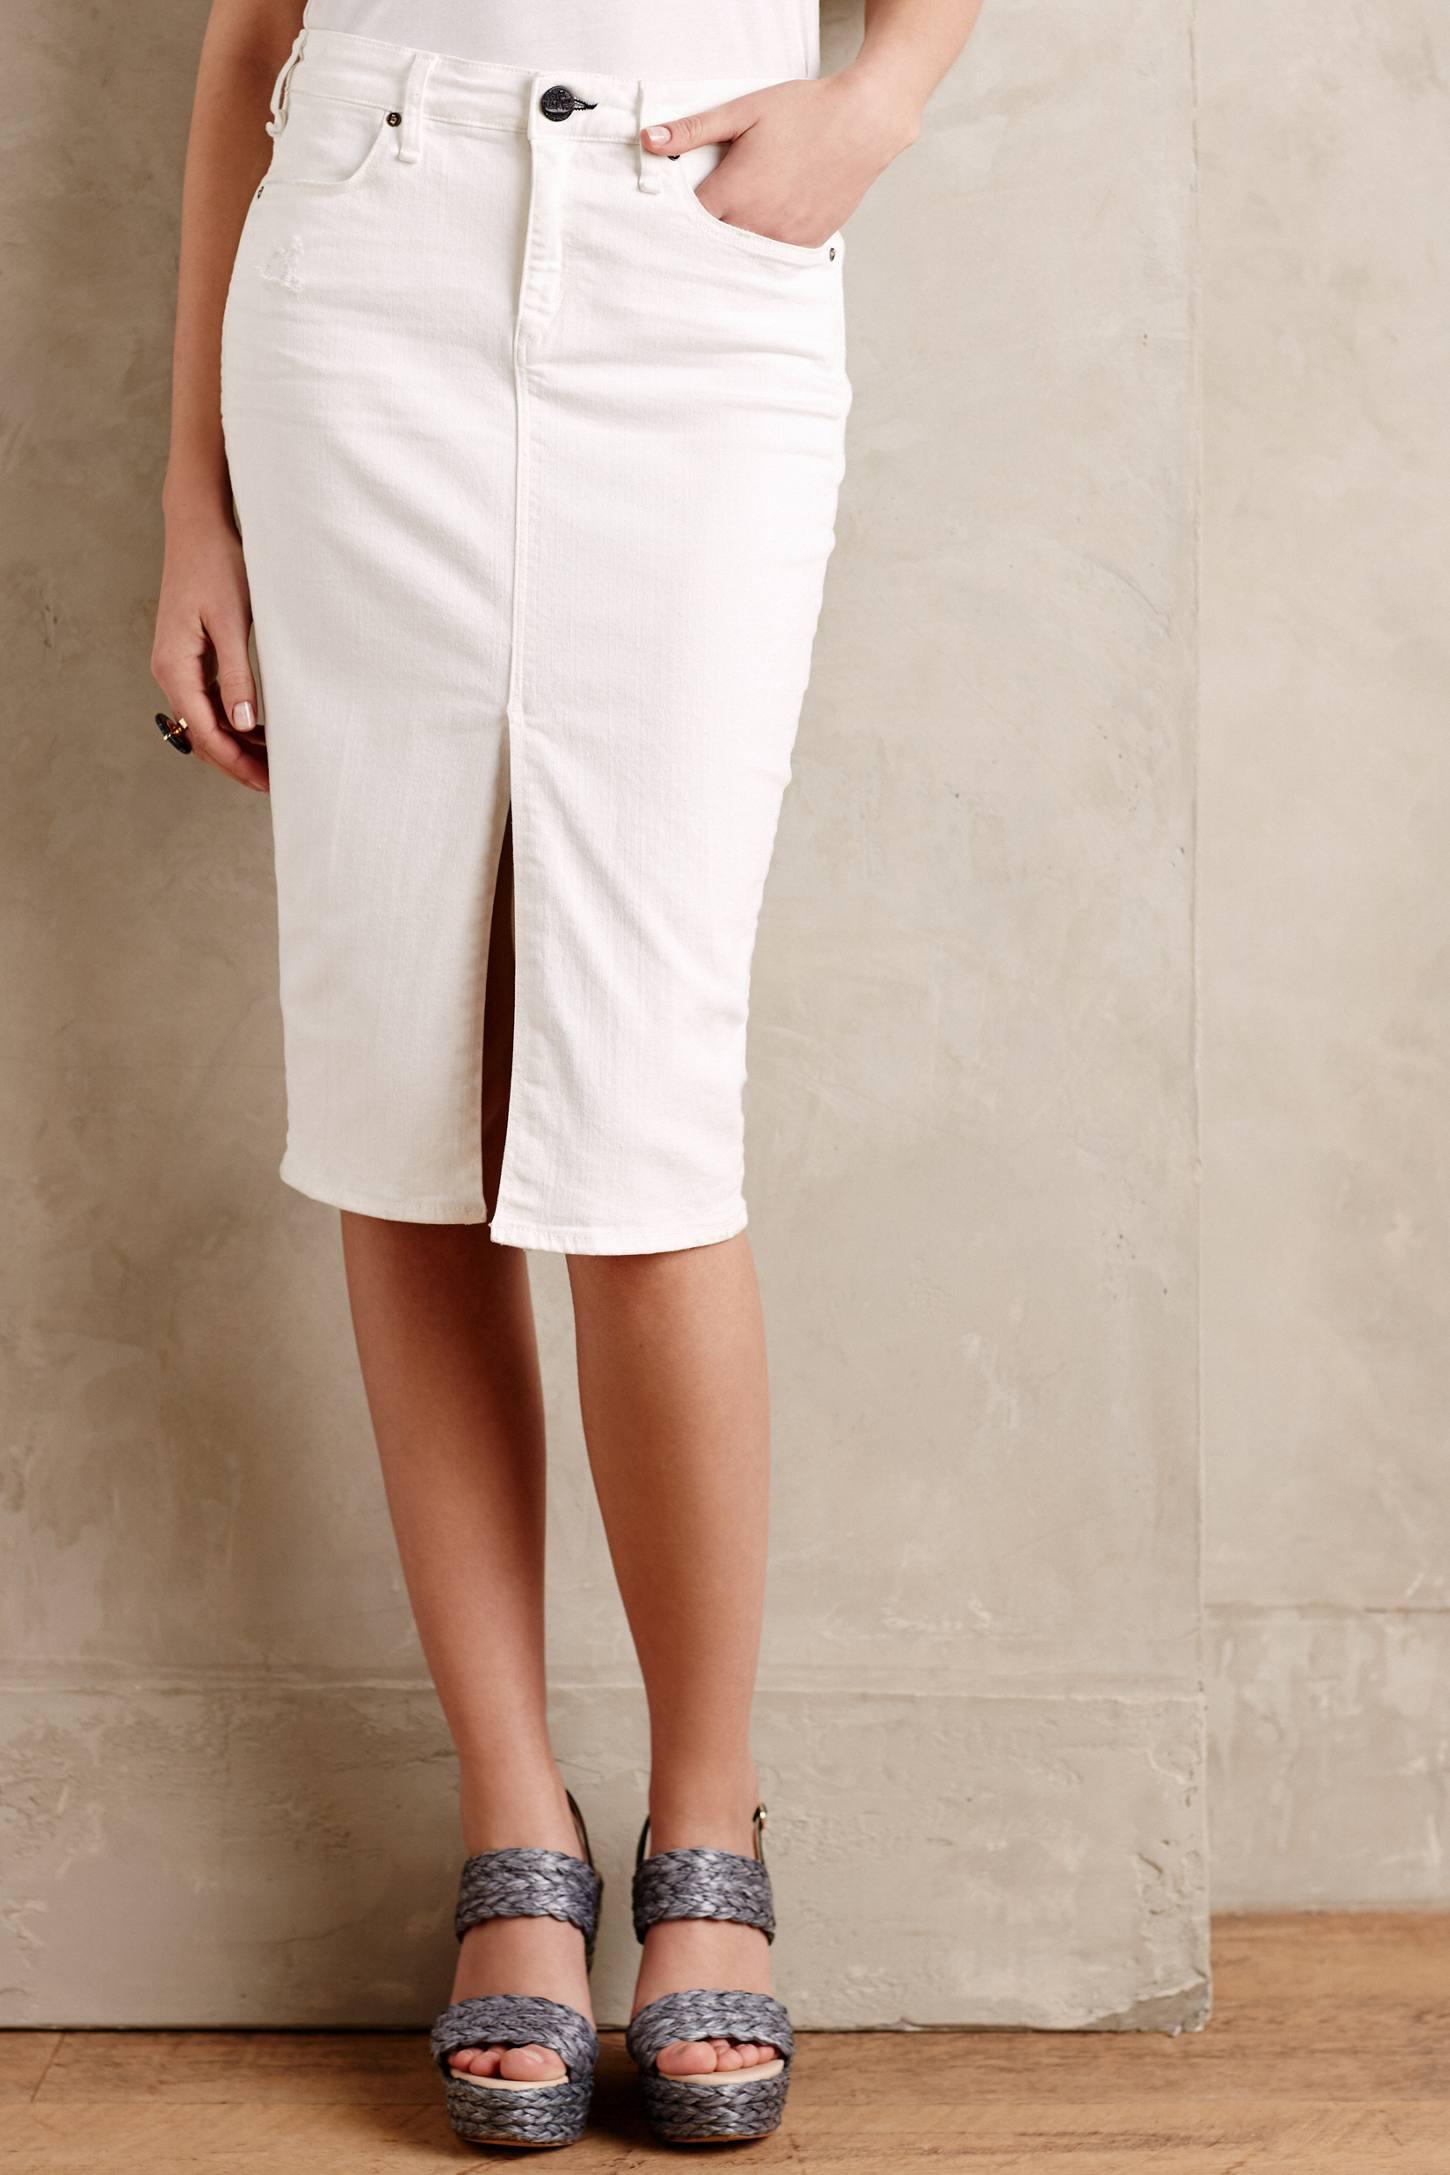 Mcguire Marino Denim Pencil Skirt in Natural | Lyst